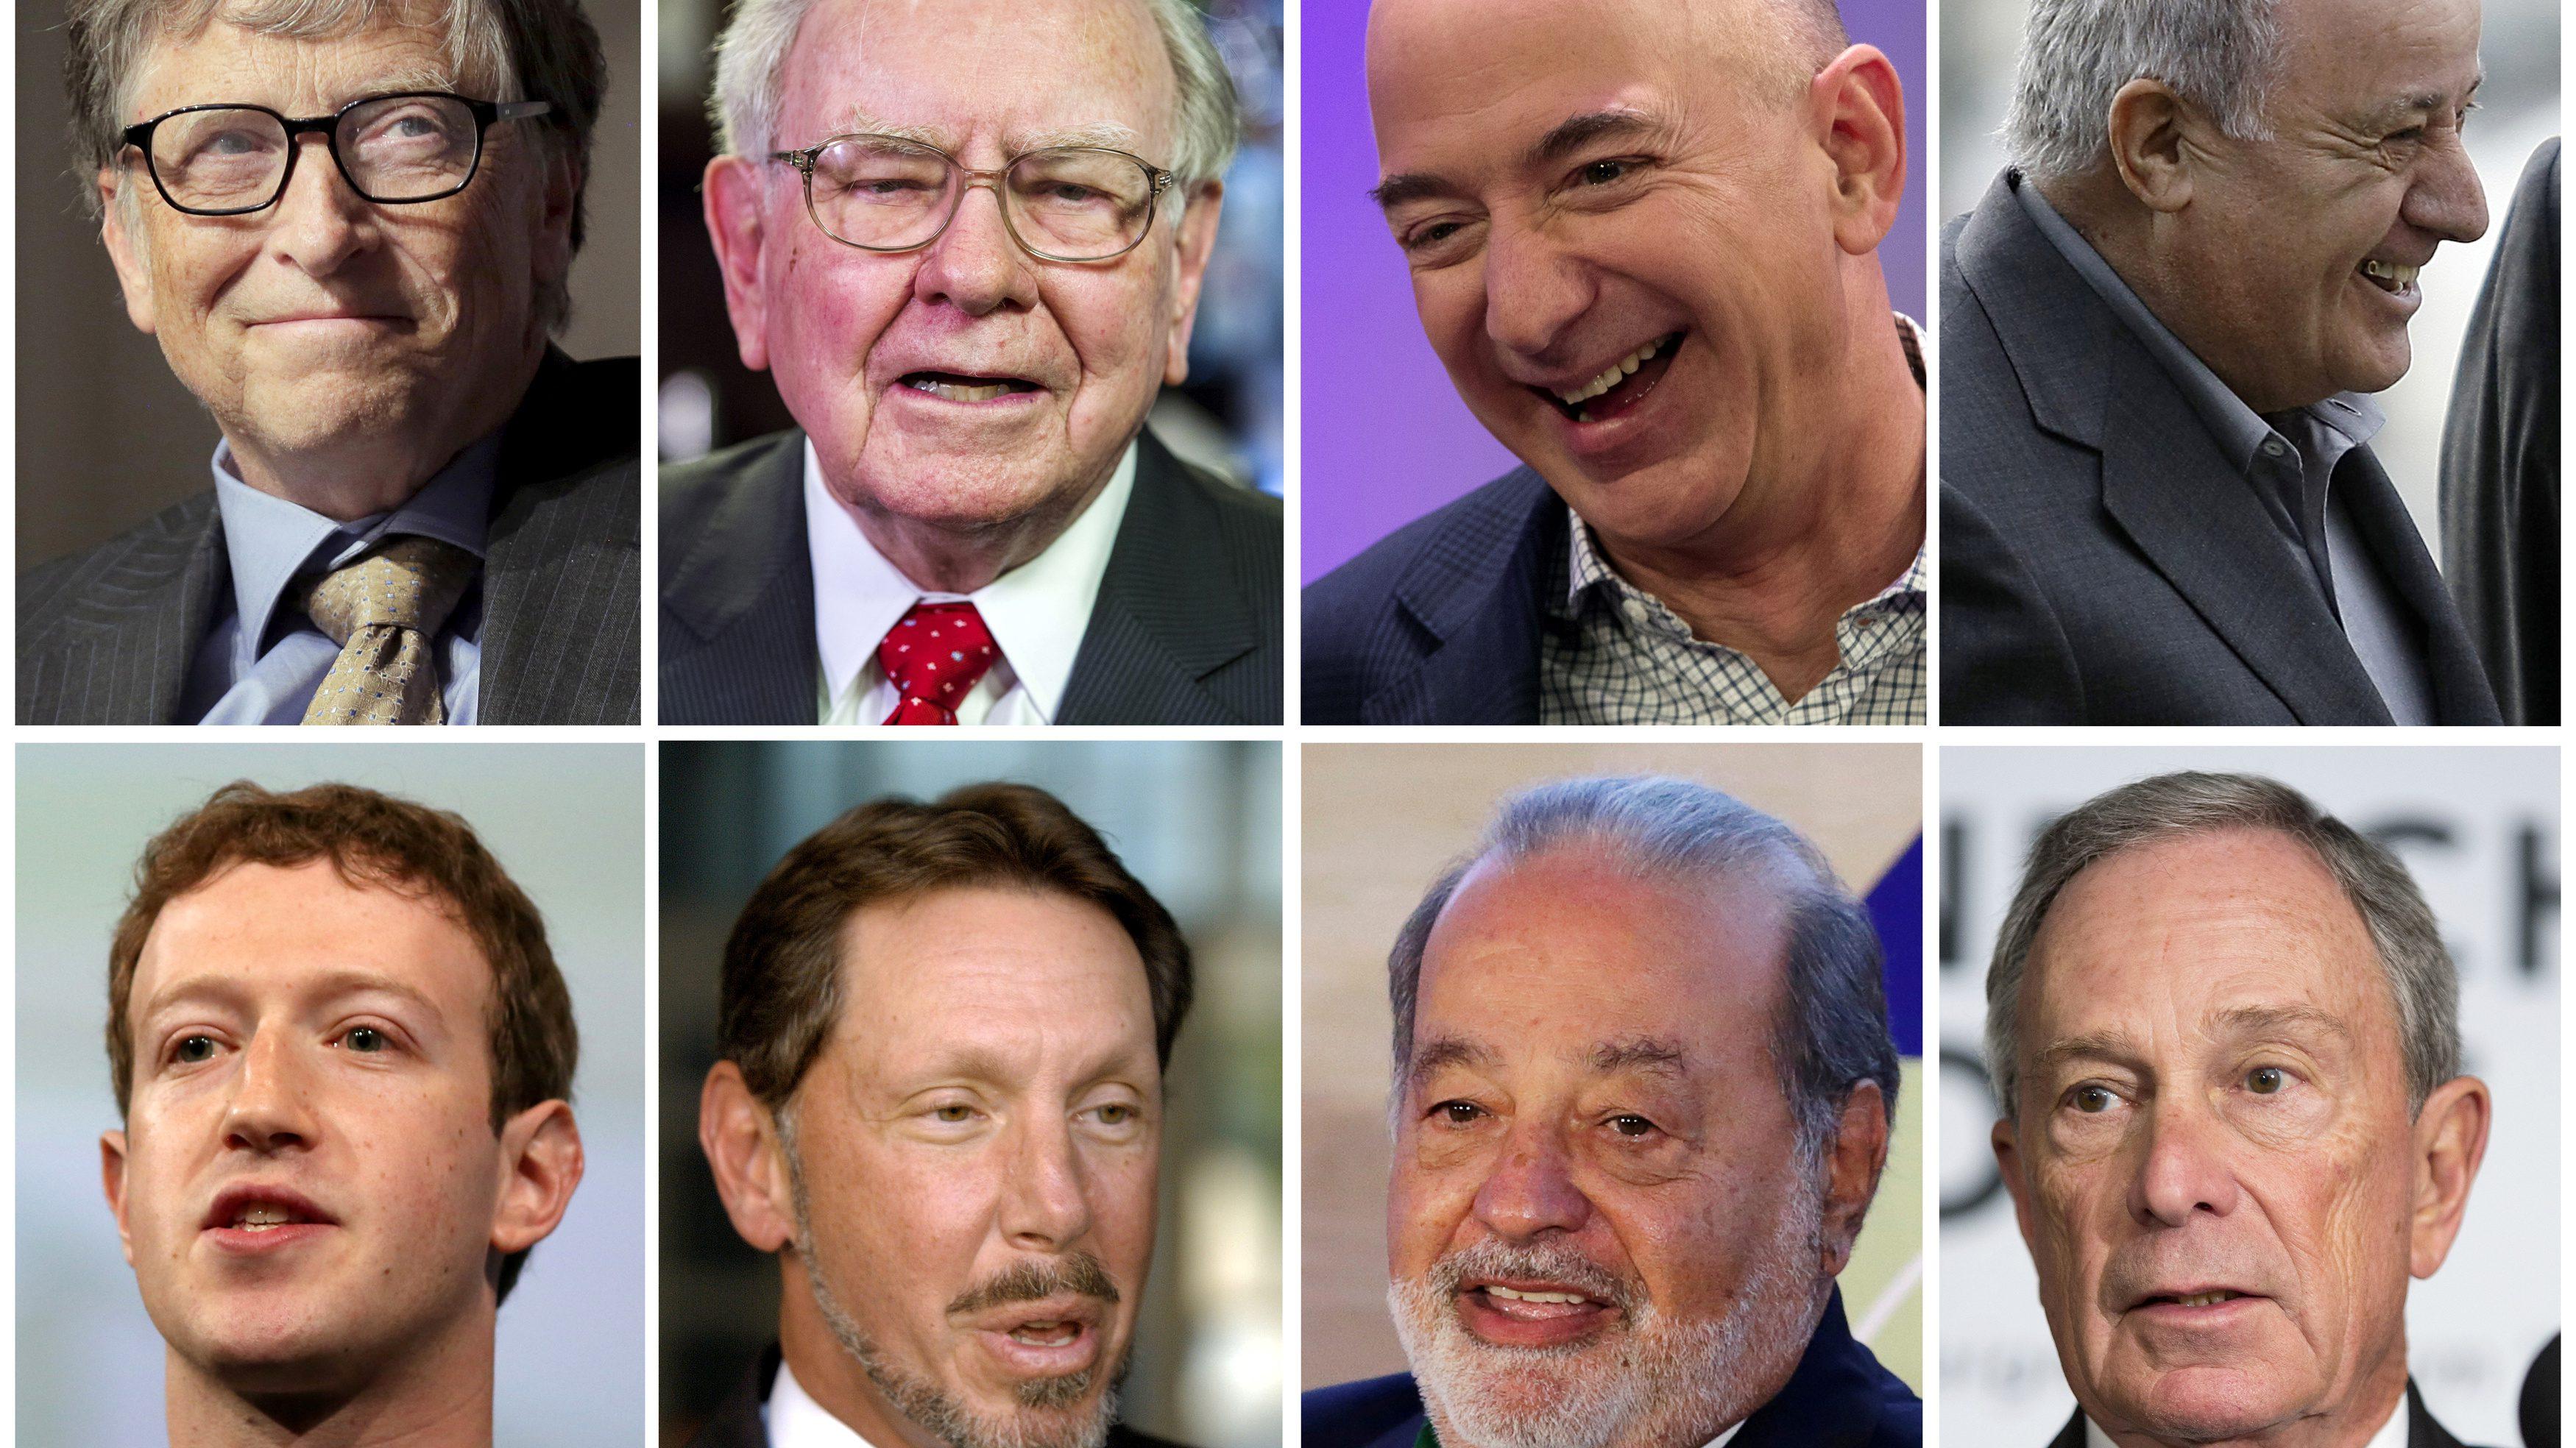 combination photo shows (top, L-R) Bill Gates, Warren Buffett, Jeff Bezos, Amancio Ortega, (bottom, L-R) Mark Zuckerberg, Larry Ellison, Carlos Slim and Michael Bloomberg.